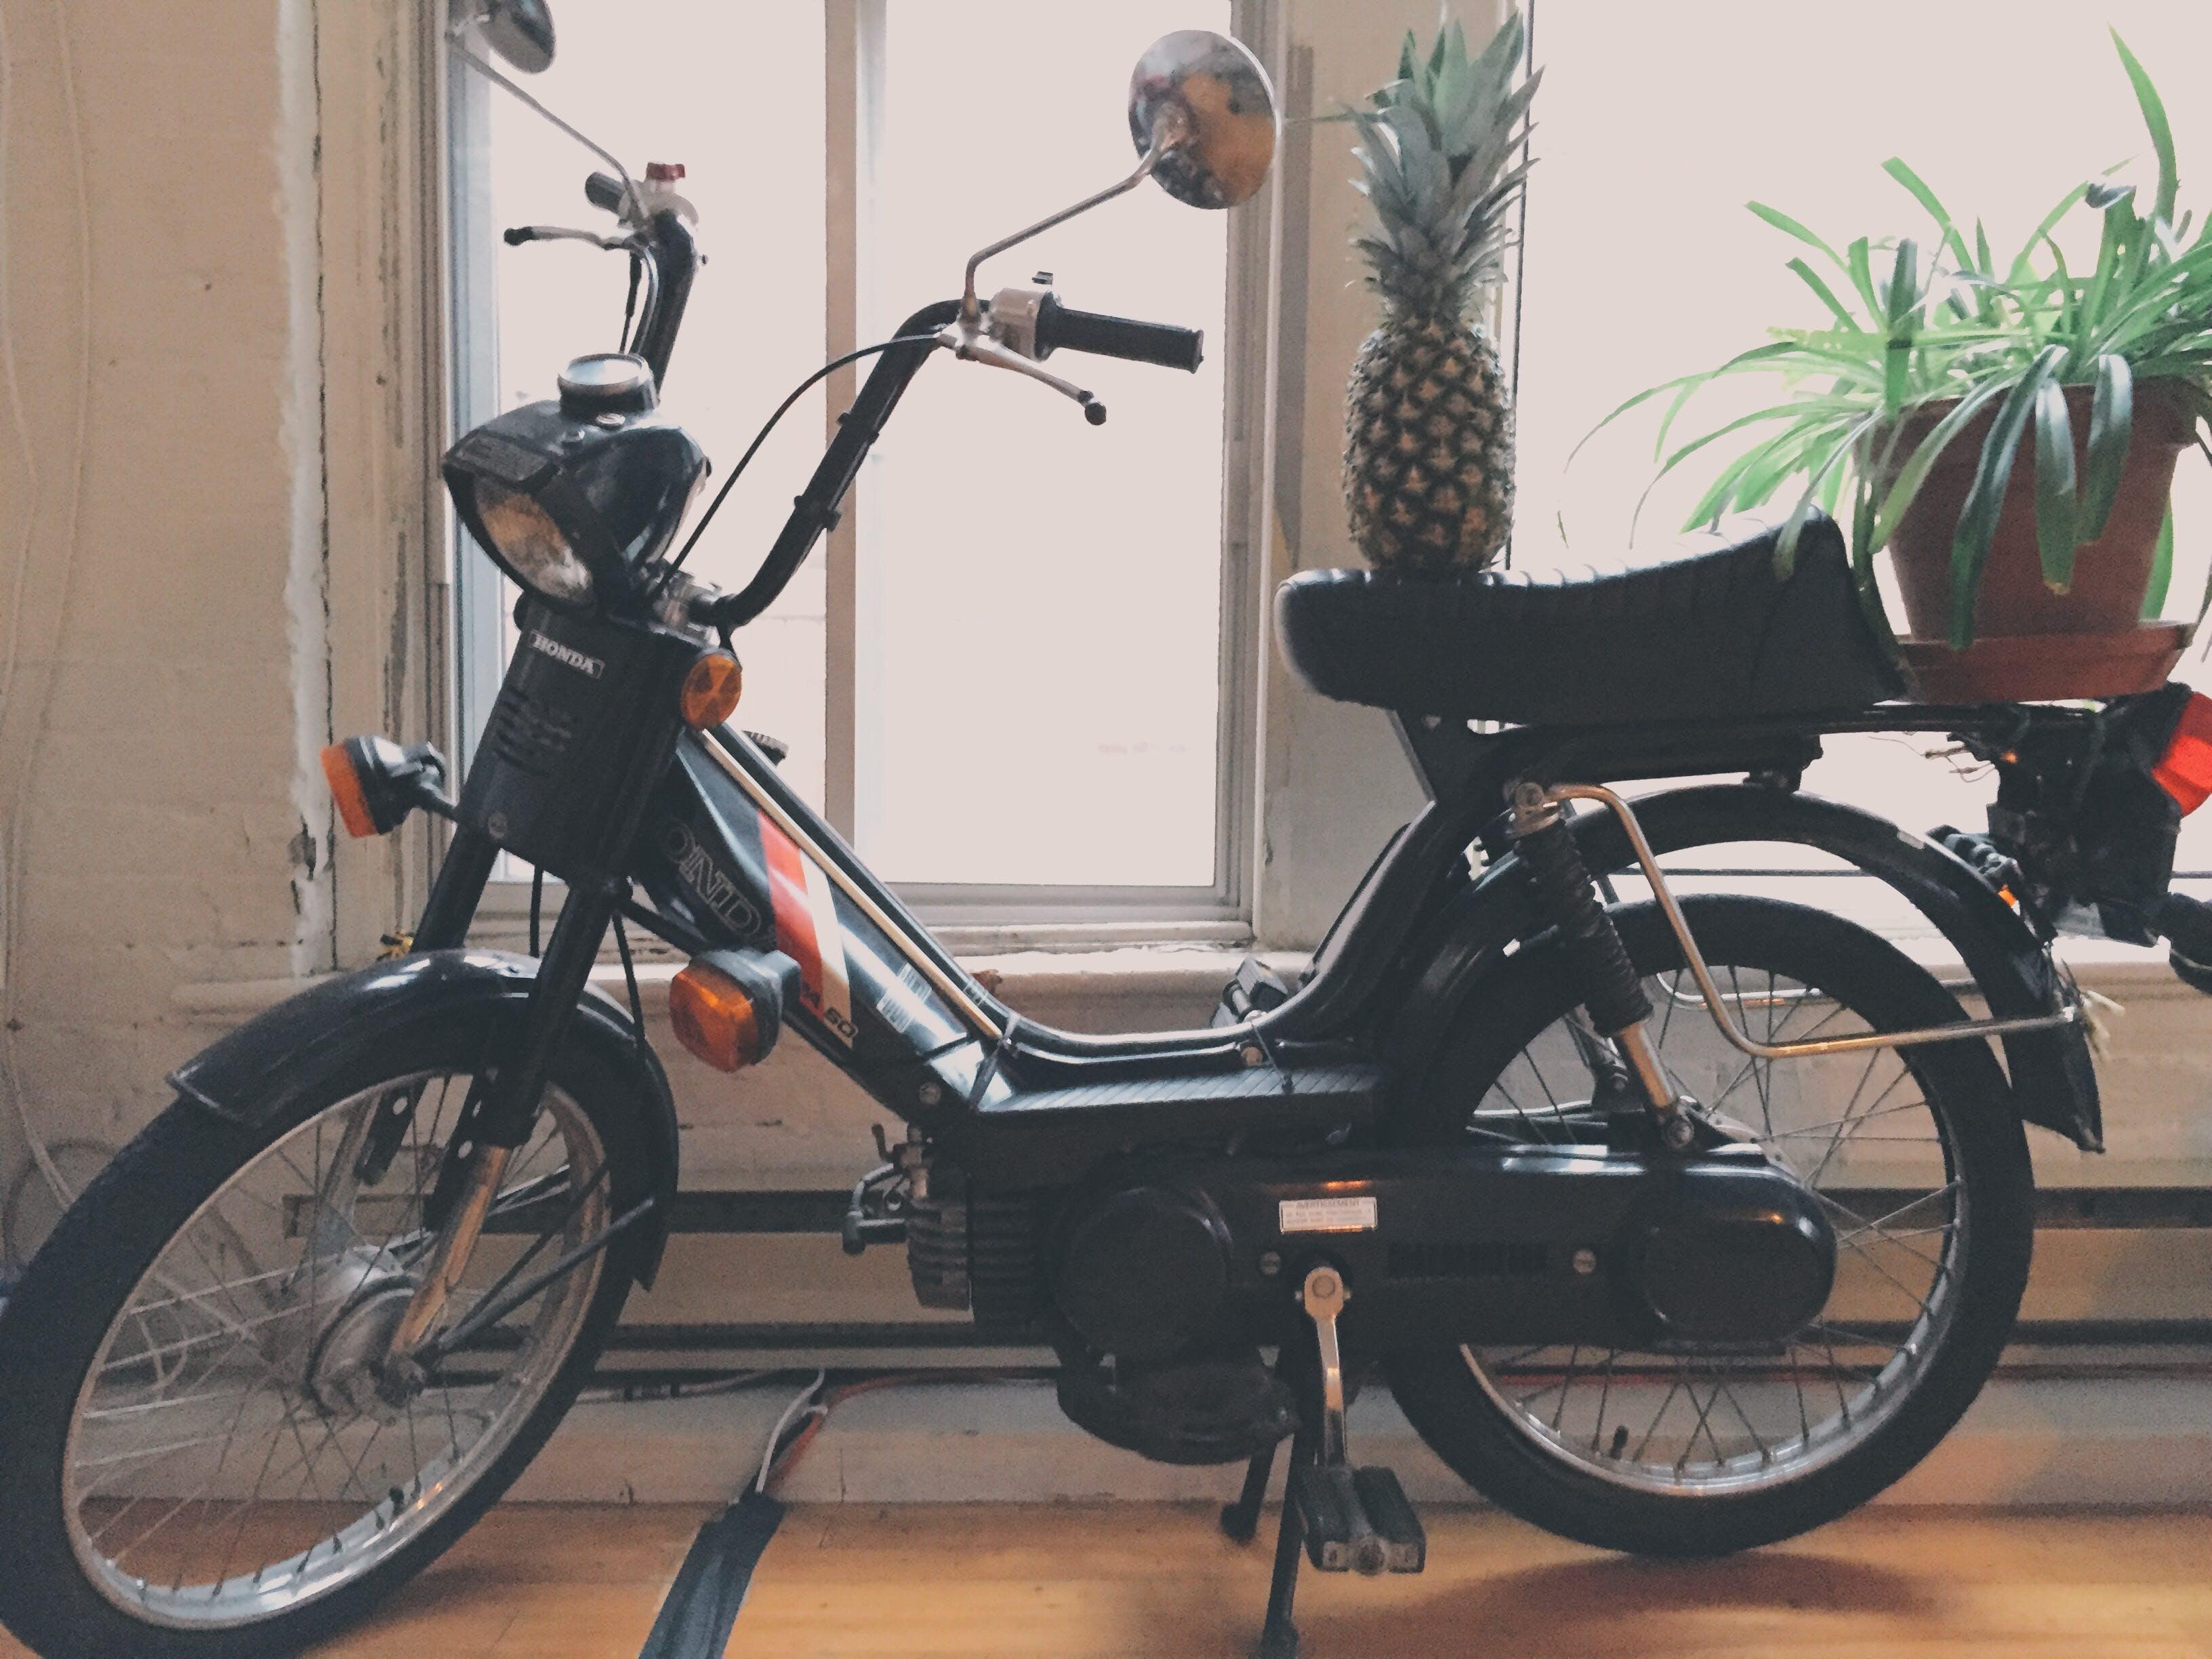 Pineapple Fruit on Motorized Bike